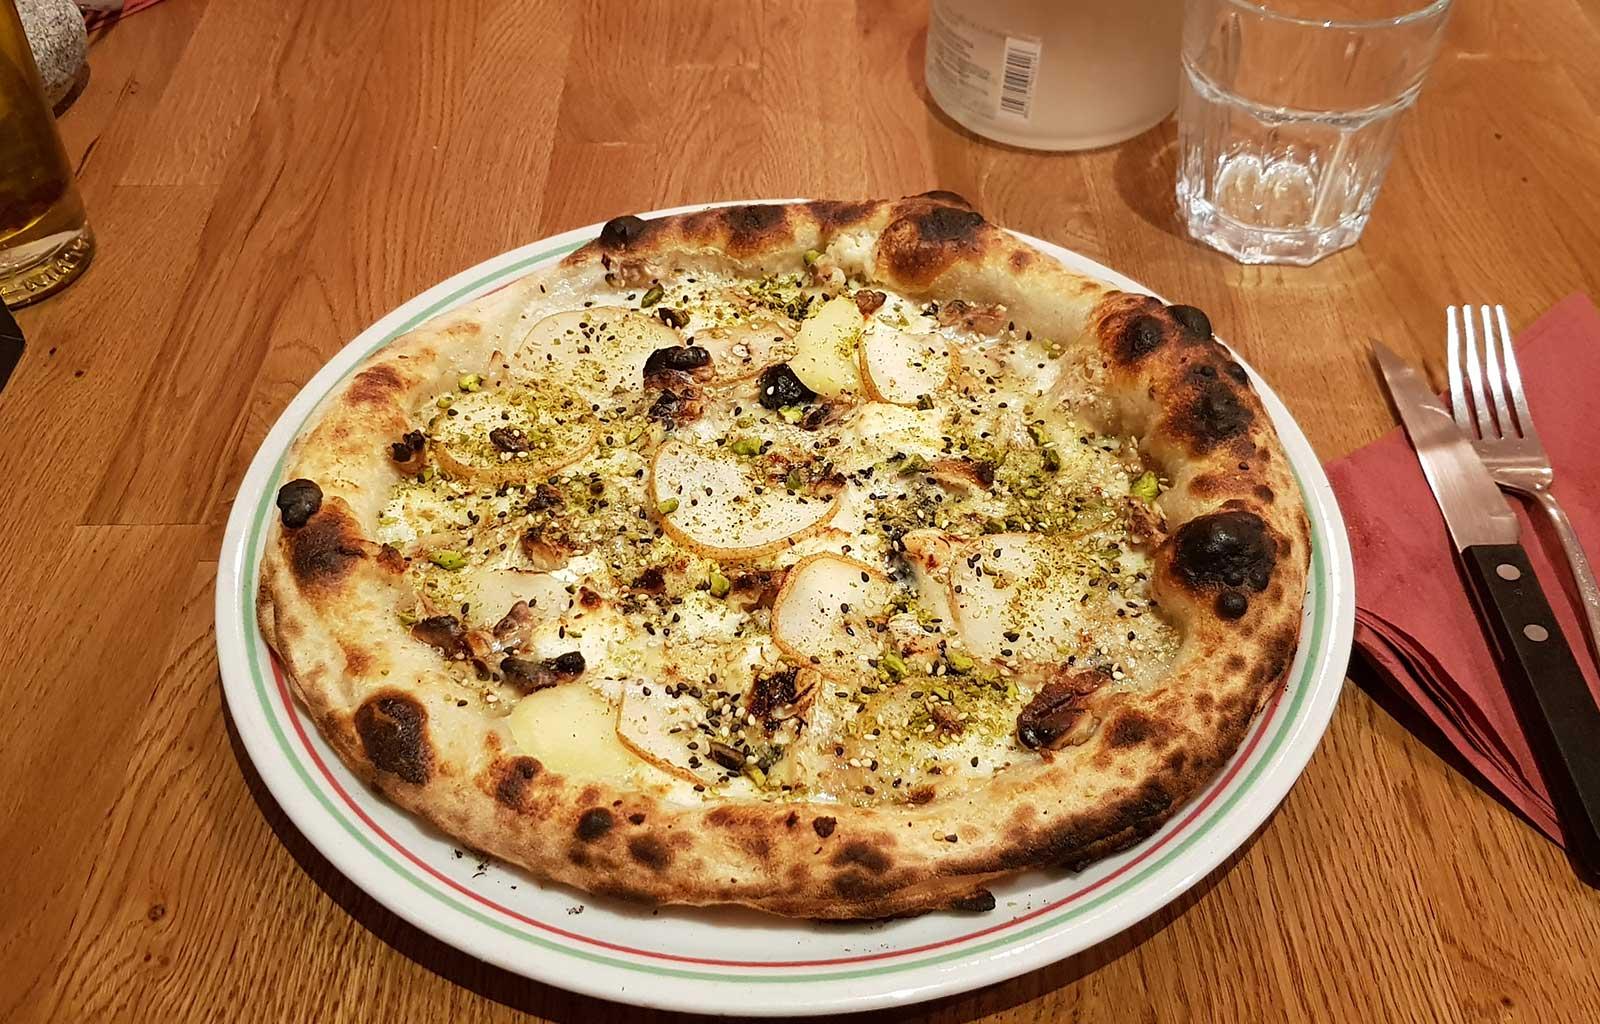 Vezzo pizza